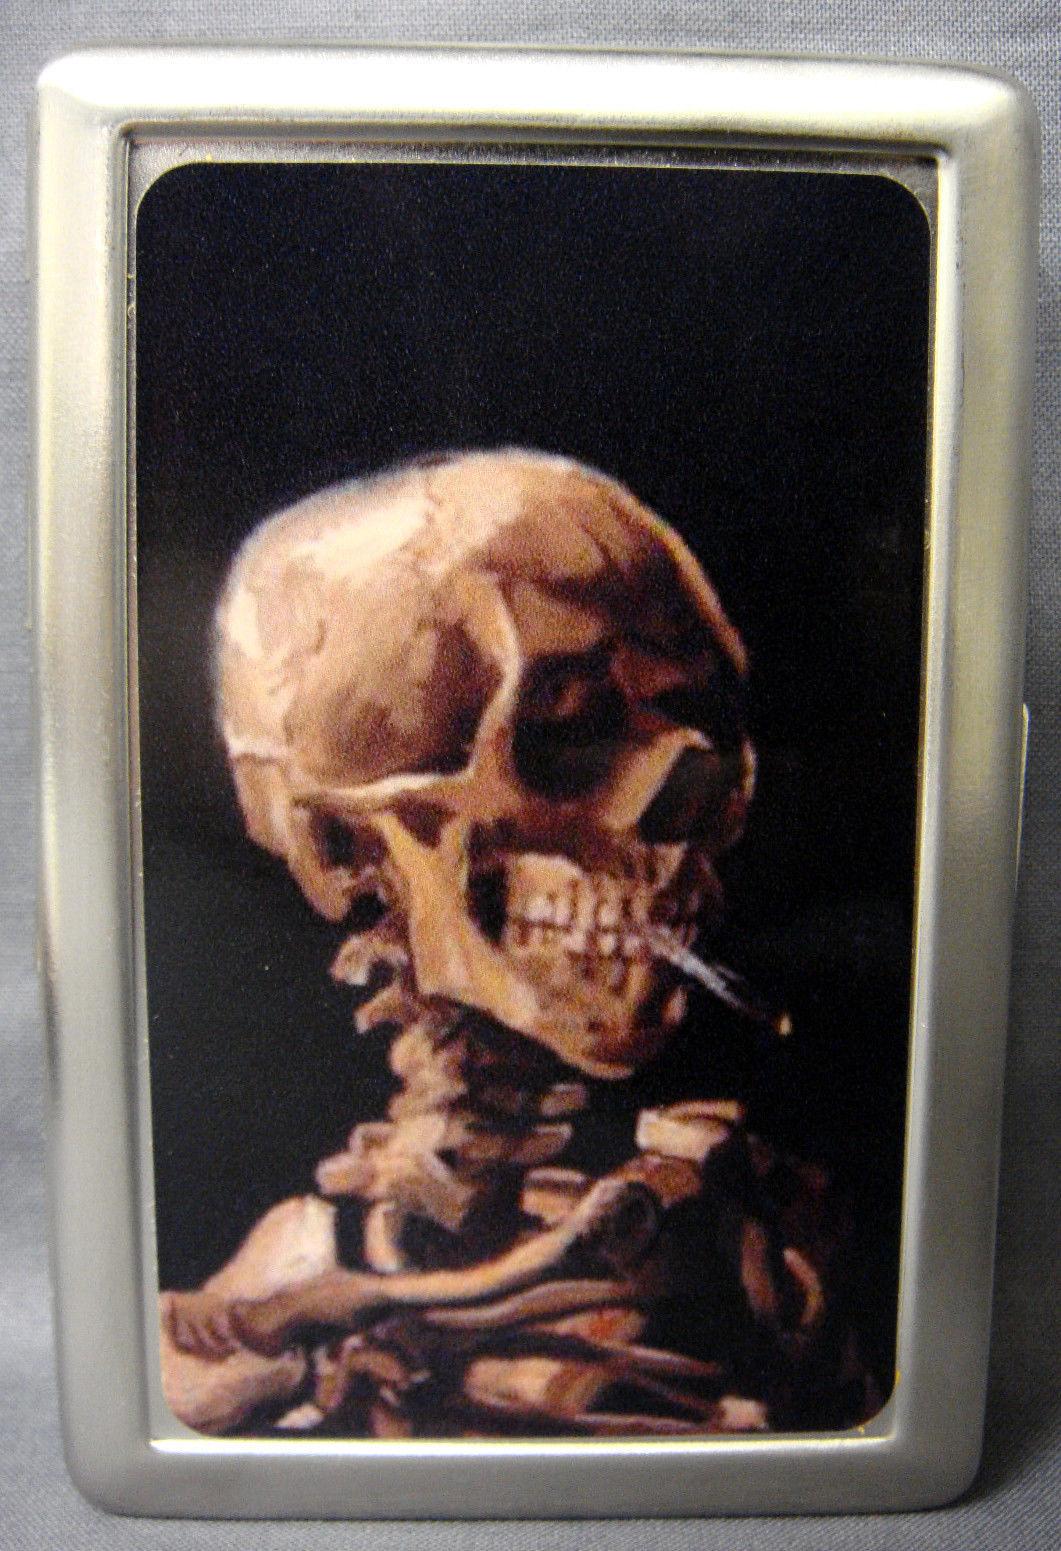 Van Gogh 02 Smoking Skull Metal Silver Cigarette Case